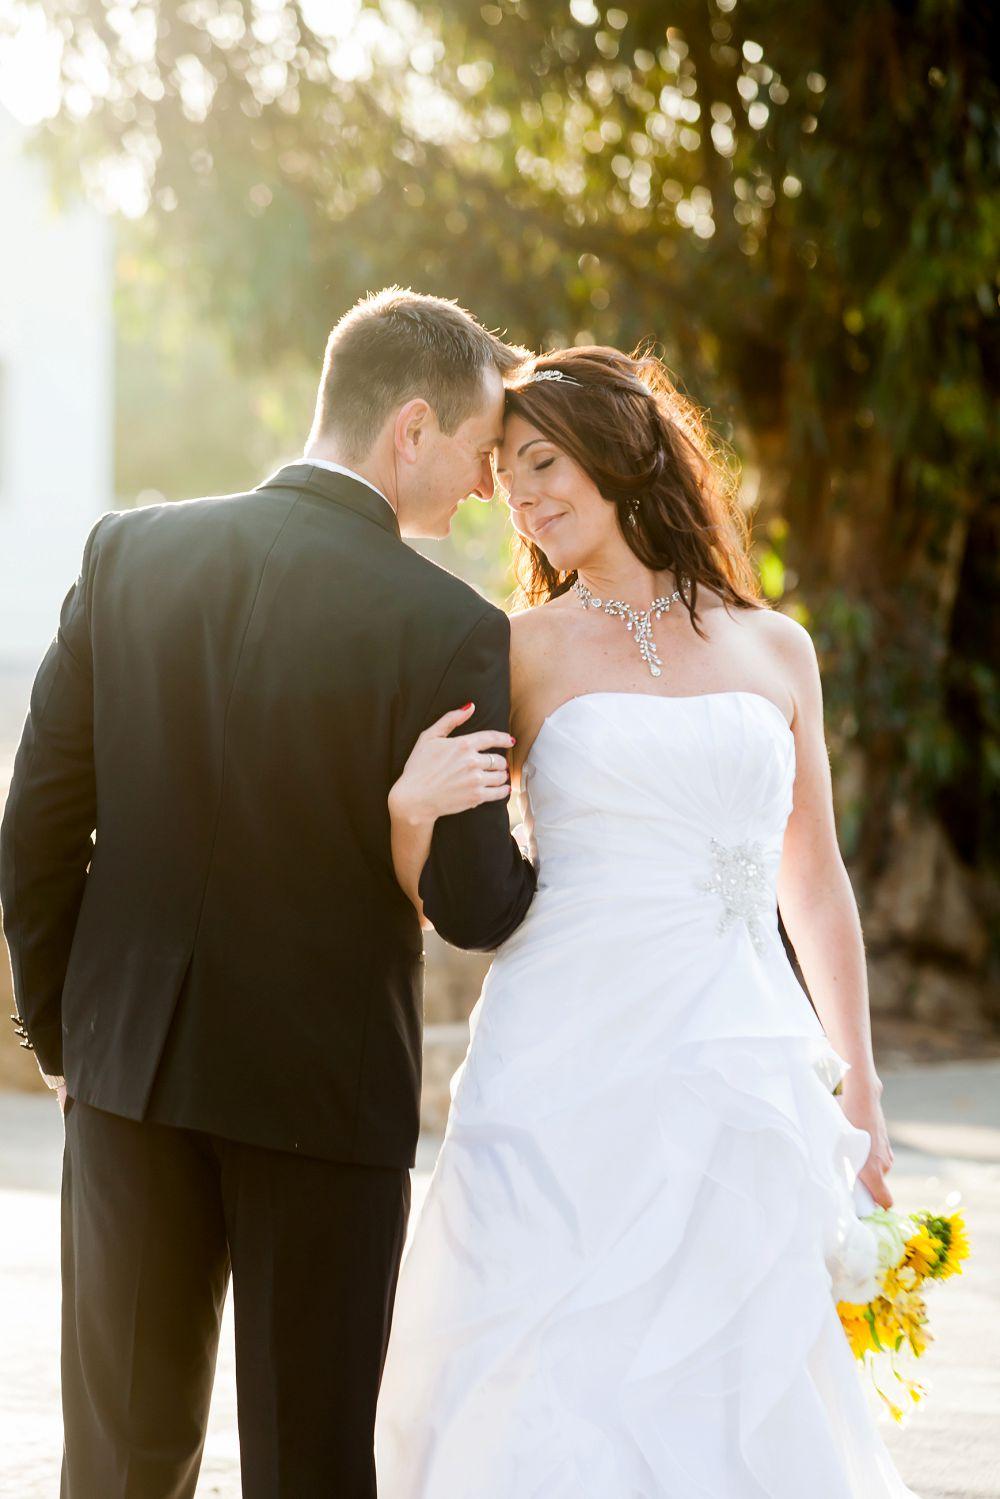 De Malle Meul Wedding Expressions Photography066